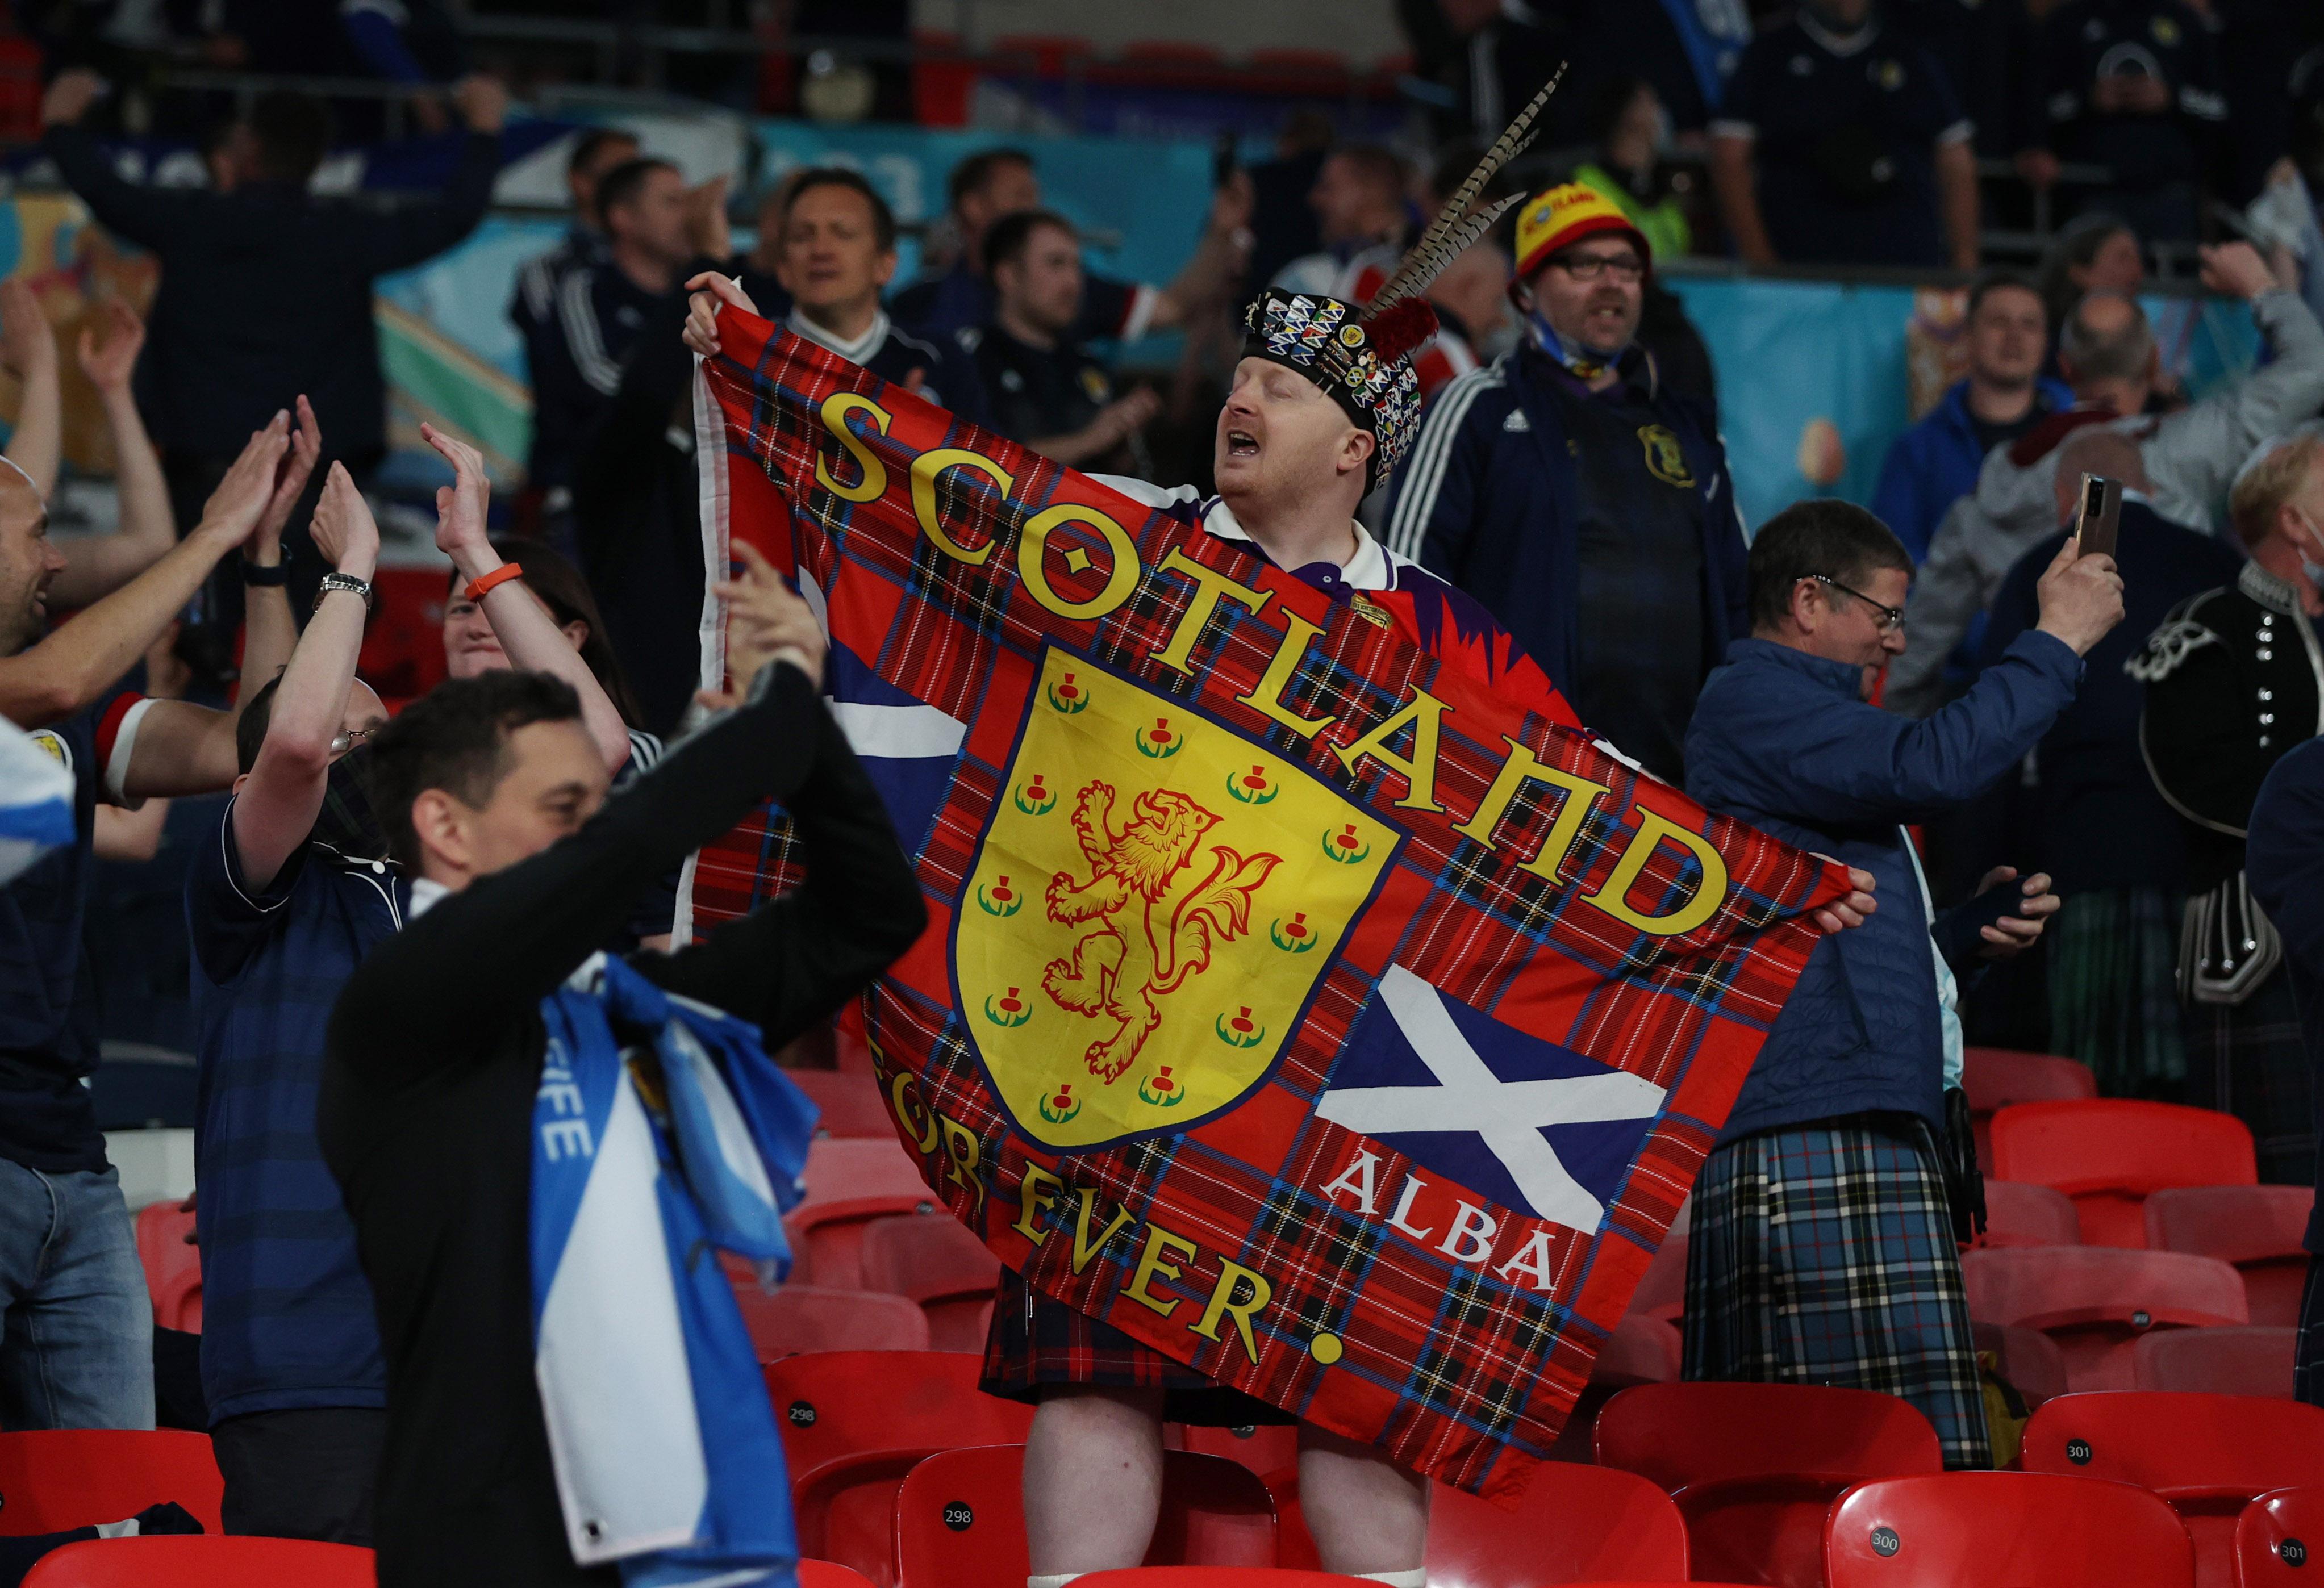 Soccer Football - Euro 2020 - Group D - England v Scotland - Wembley Stadium, London, Britain - June 18, 2021 Scotland fans celebrate after the match Pool via REUTERS/Carl Recine